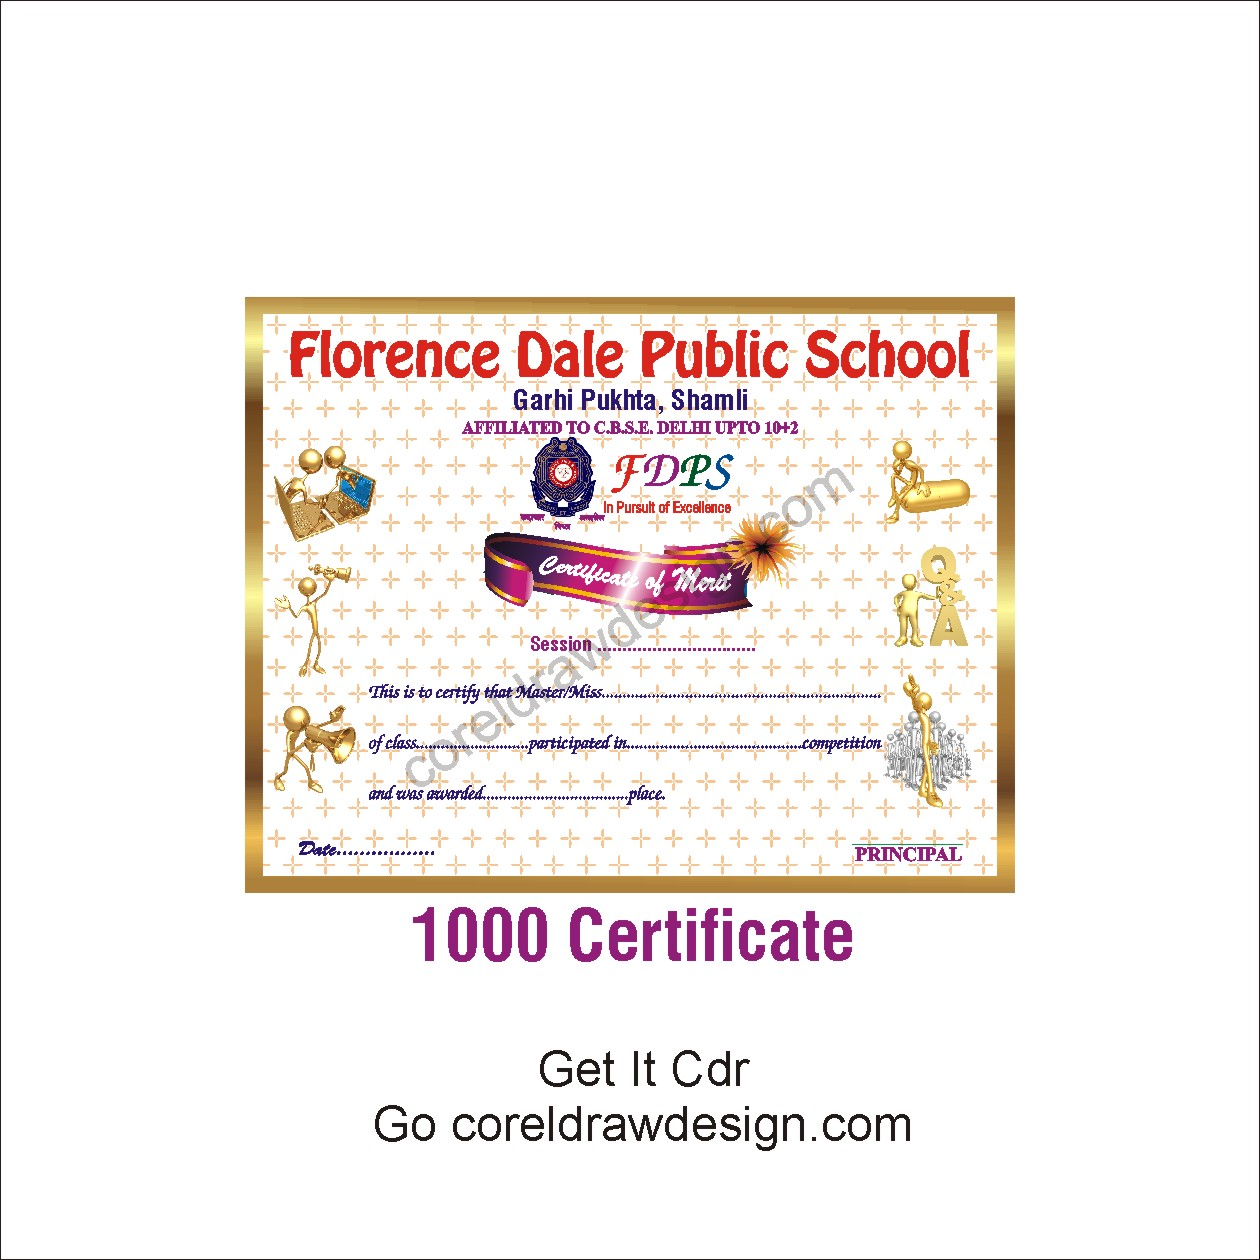 Corel Draw Design Certificate